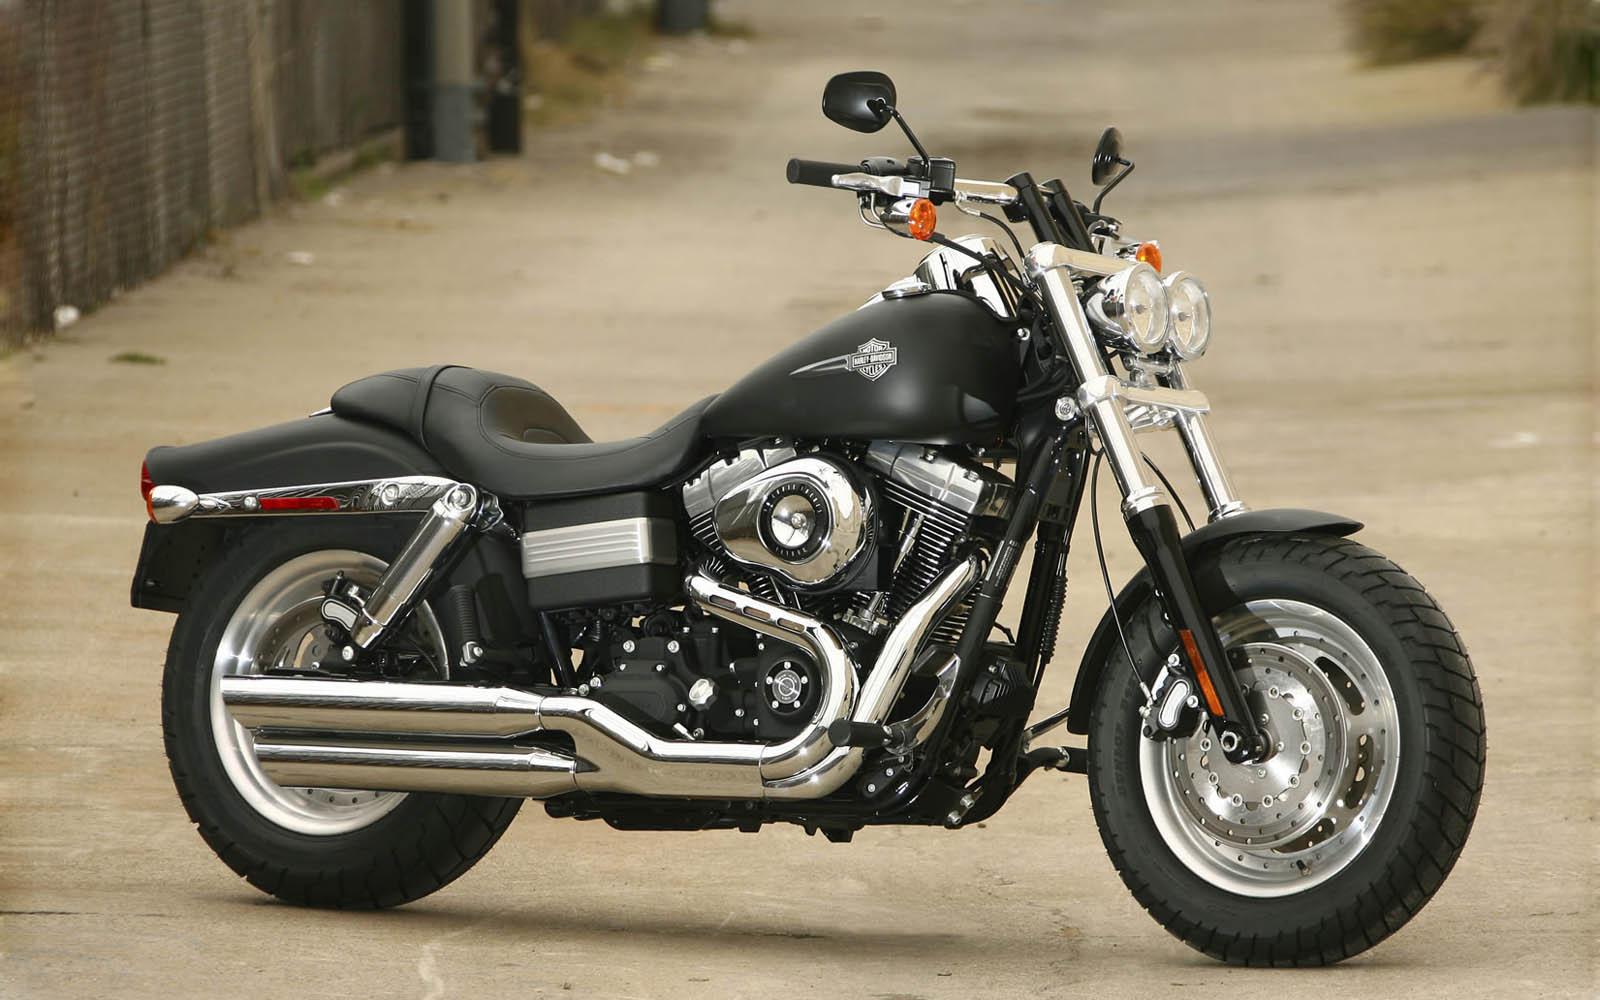 wallpapers Harley Davidson Bikes Wallpapers 1600x1000